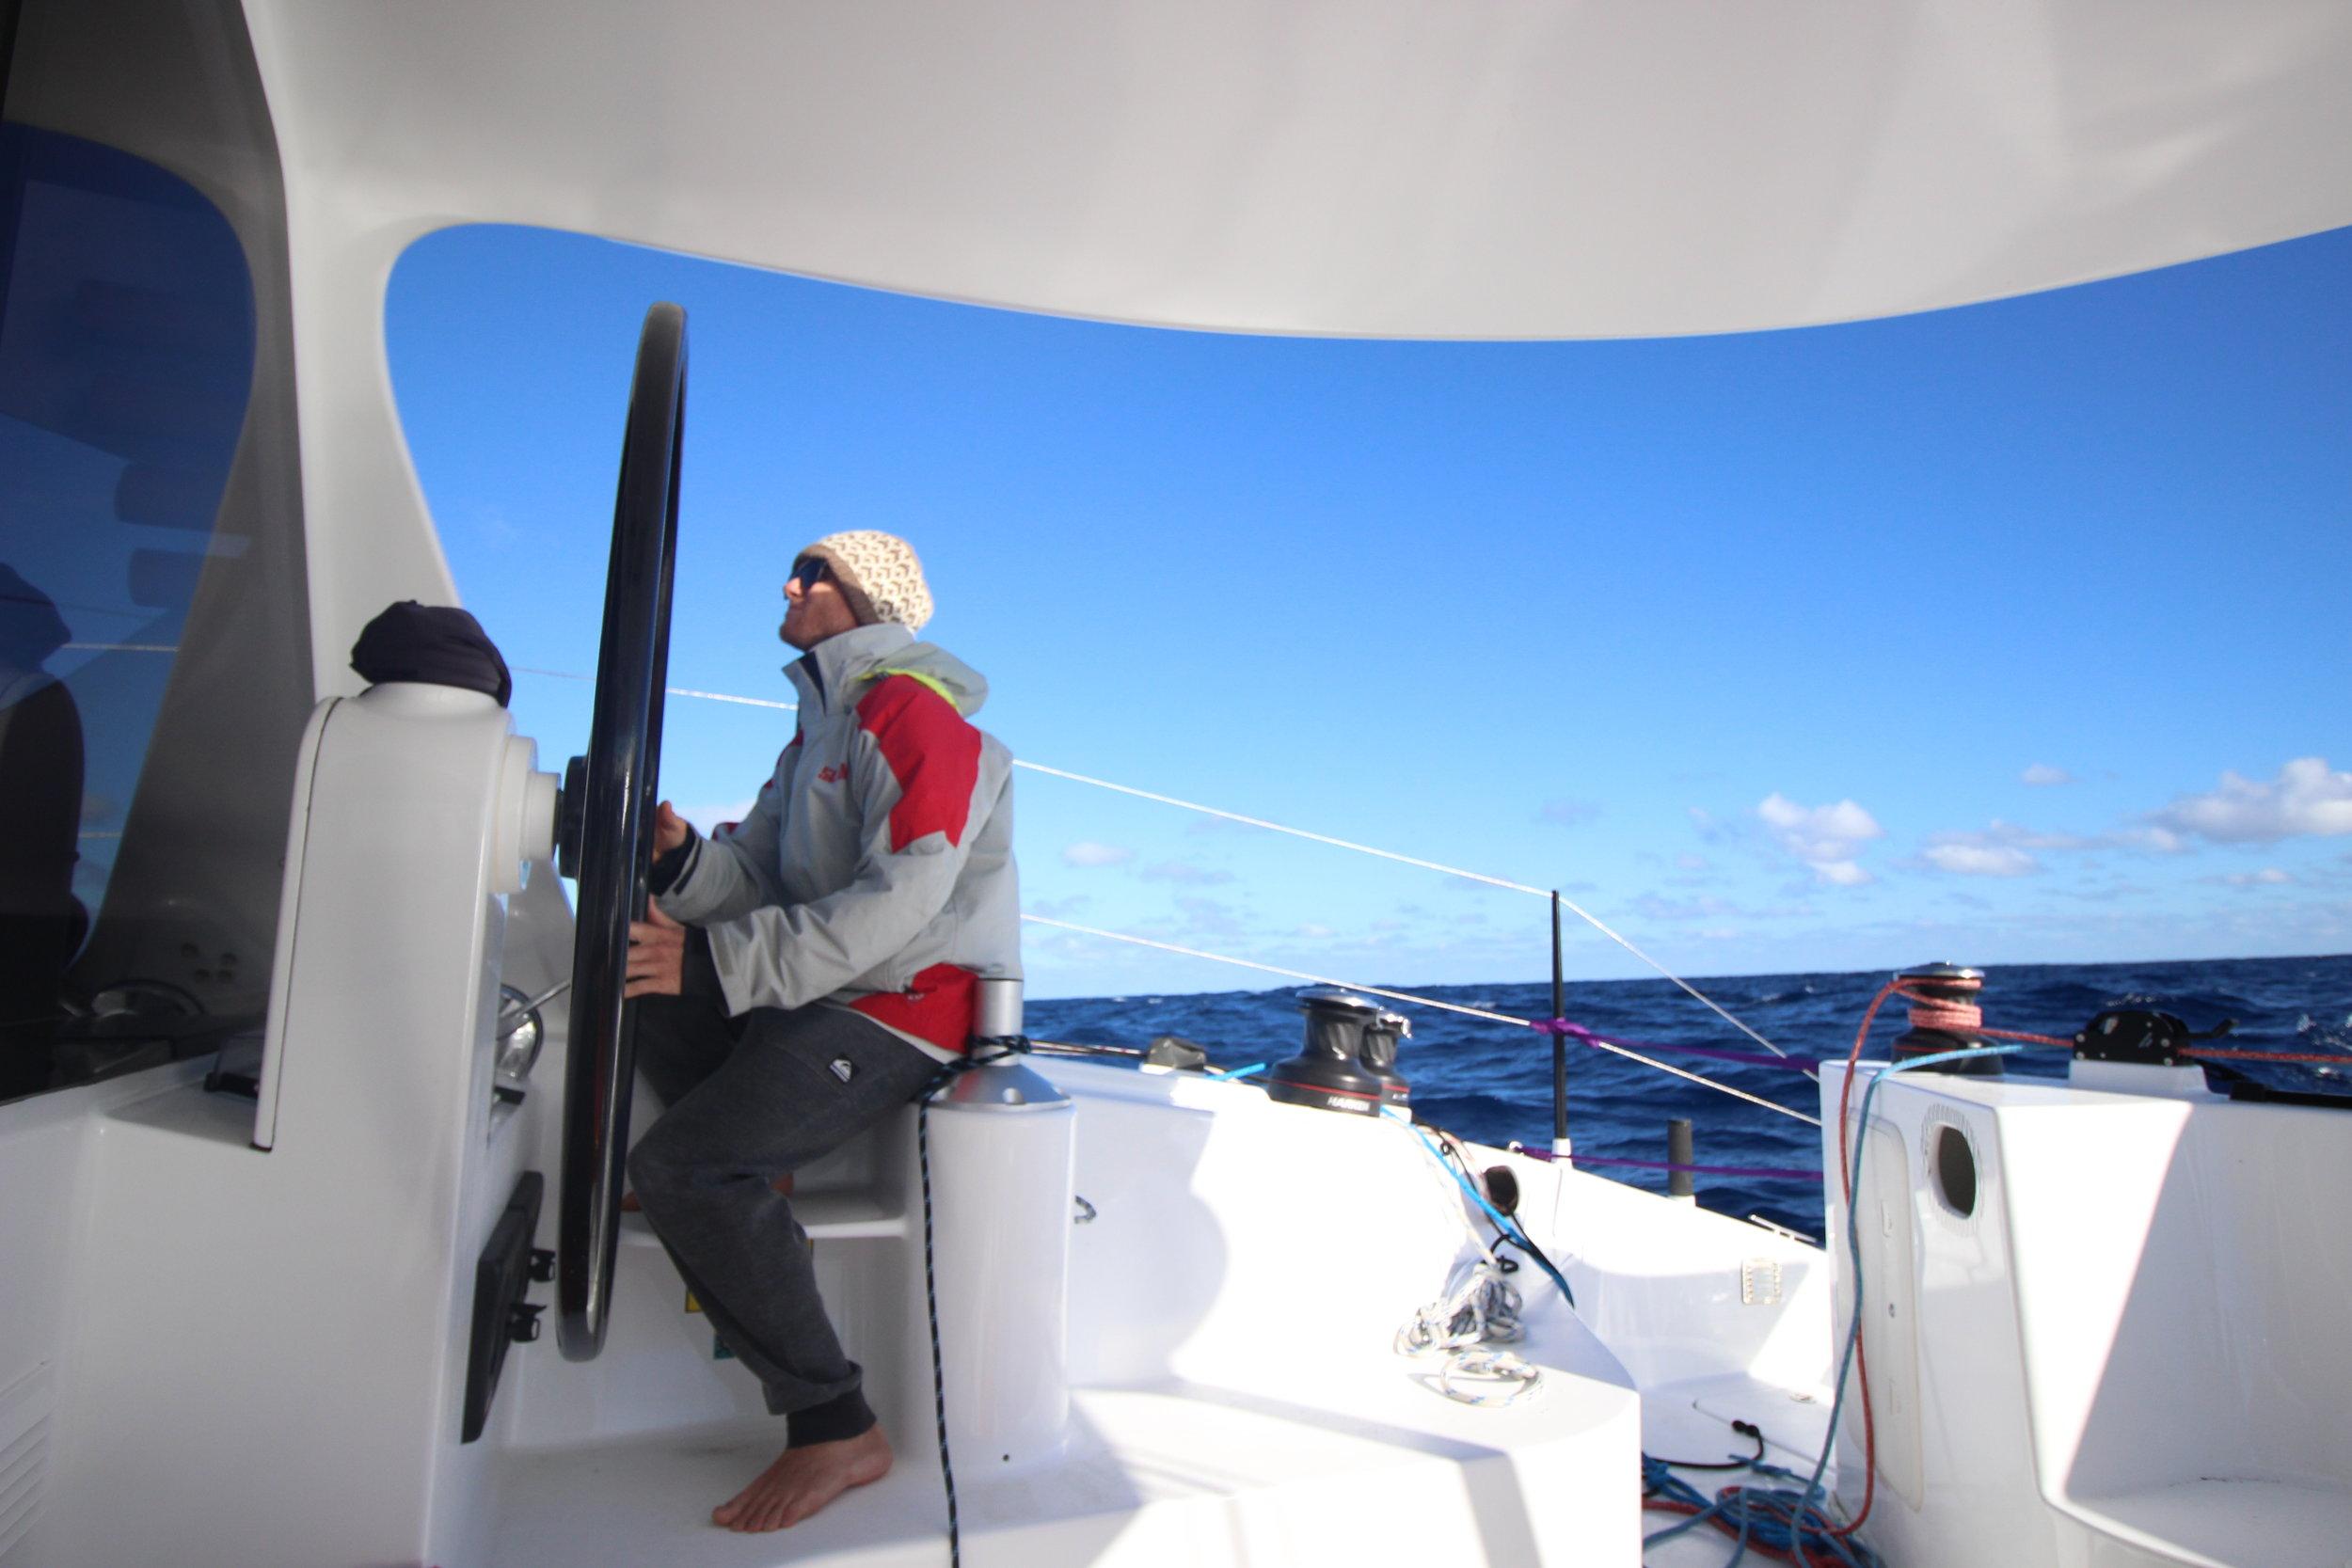 mick at the helm enjoying hand steering